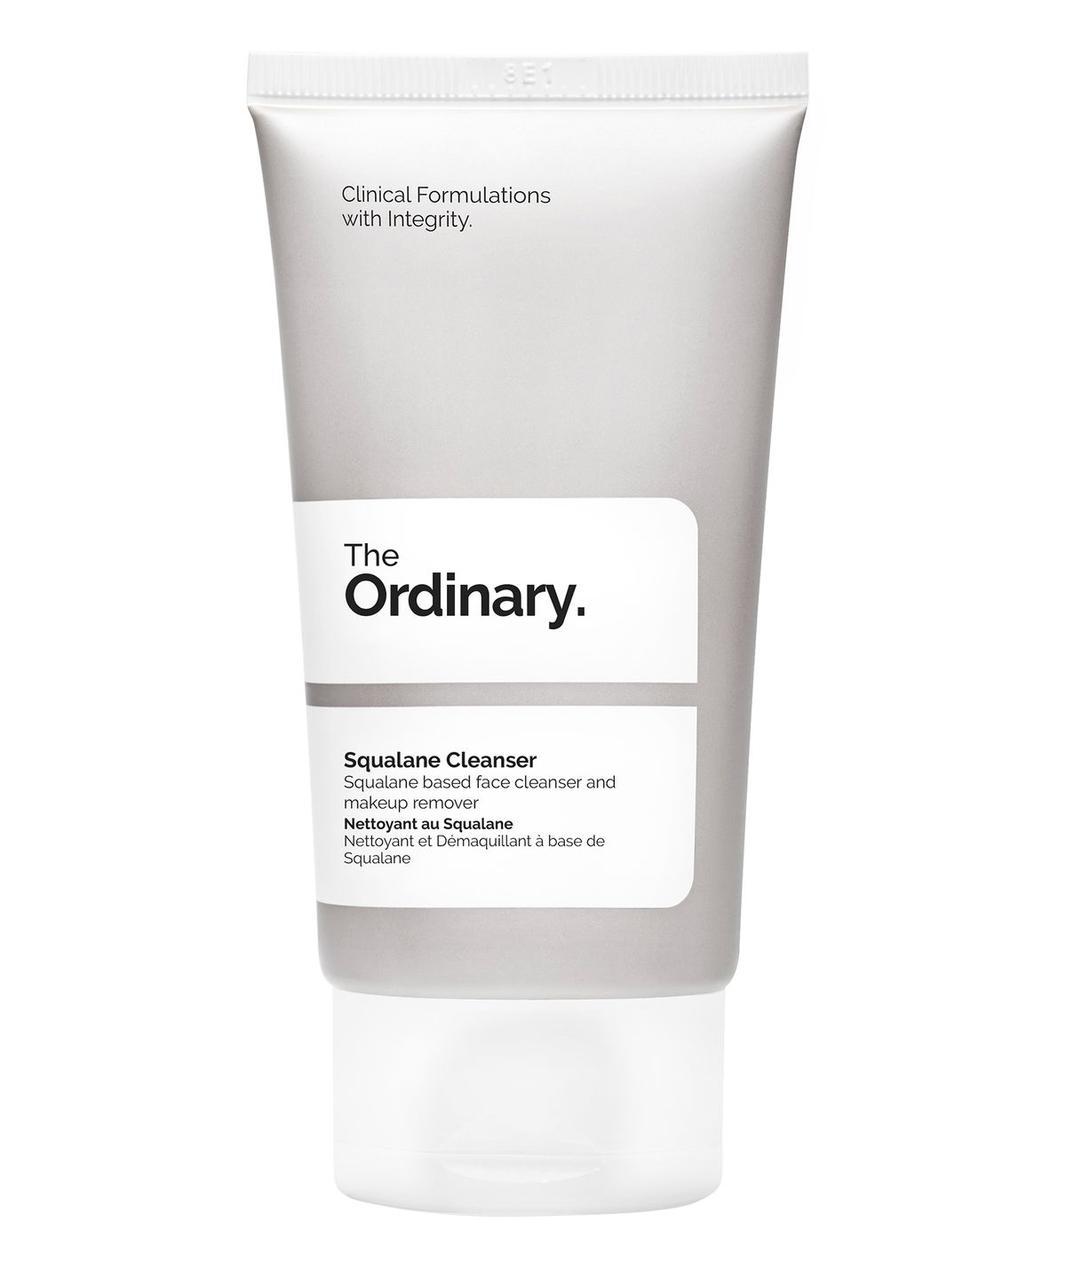 Средство для очищения кожи и снятия макияжа The Ordinary Squalane Cleanser